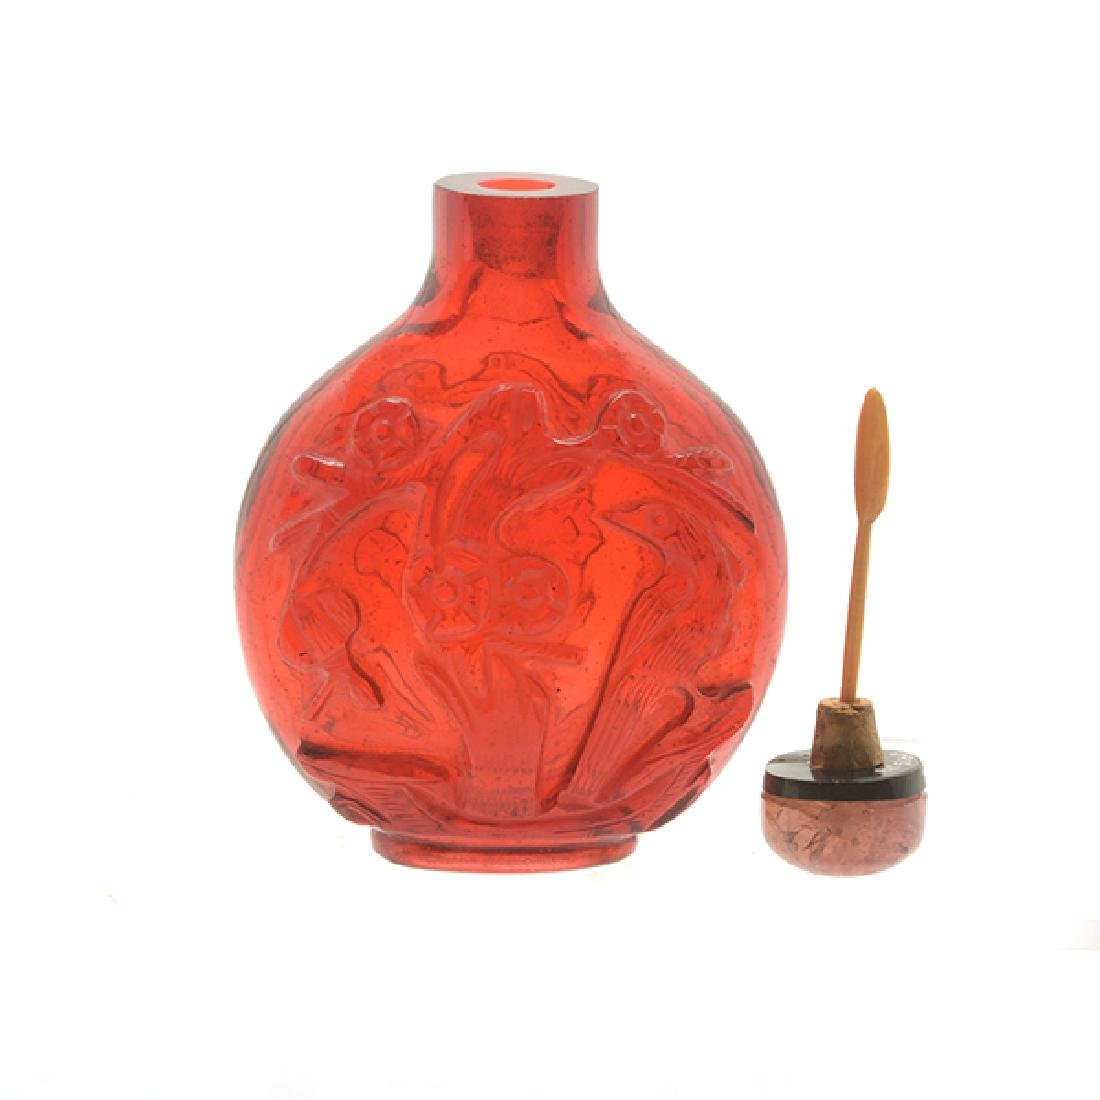 2 Monochromatic Glass Snuff Bottles, 19th C - 8